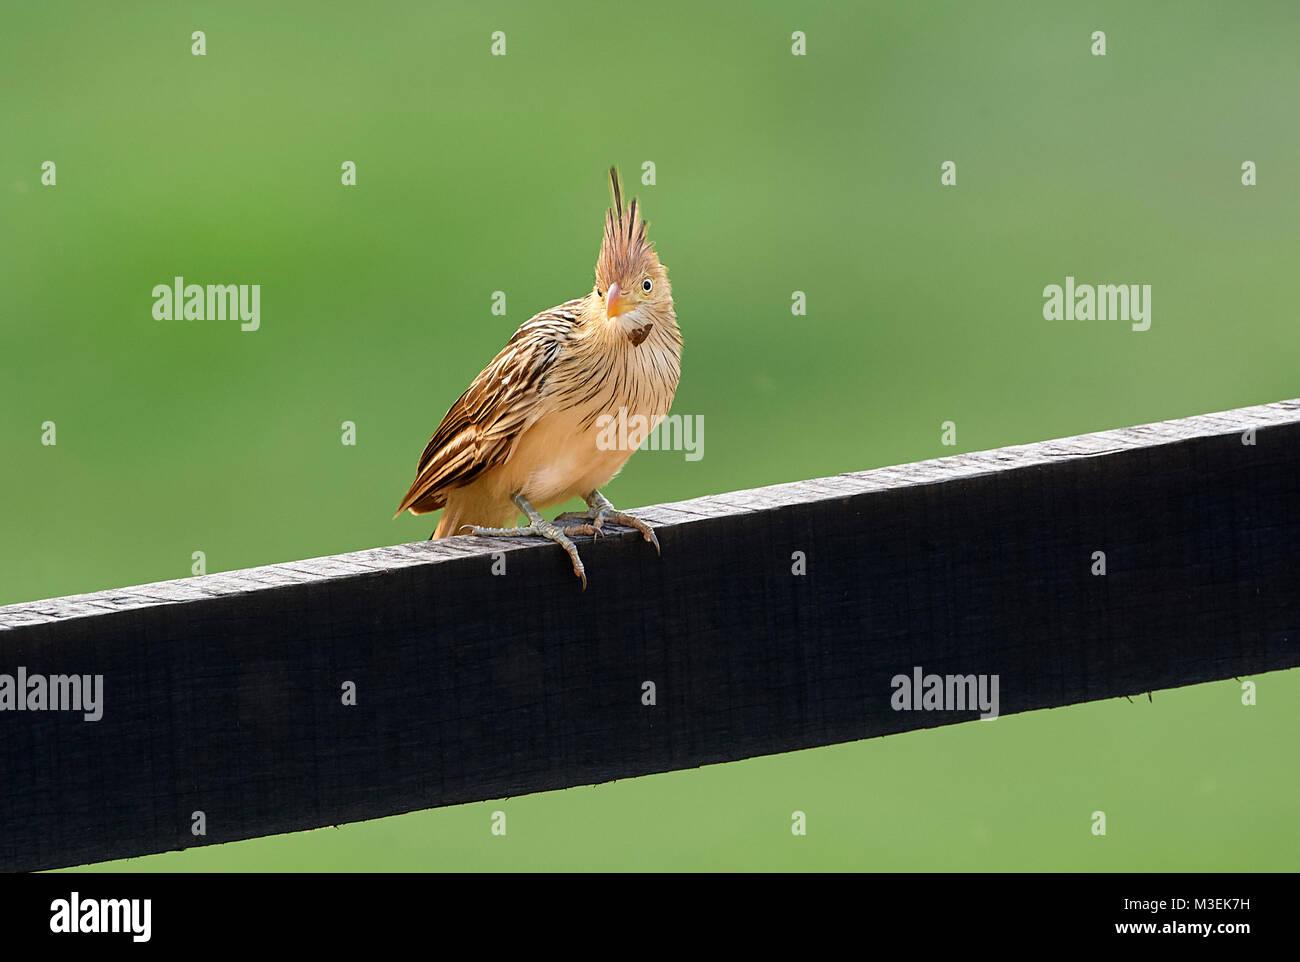 Guira Cuckoo (Guira guira) perched on a fence), Mangueiras Ranch,  Bairro da Ponte Nova, Sao Paulo, Brazil - Stock Image